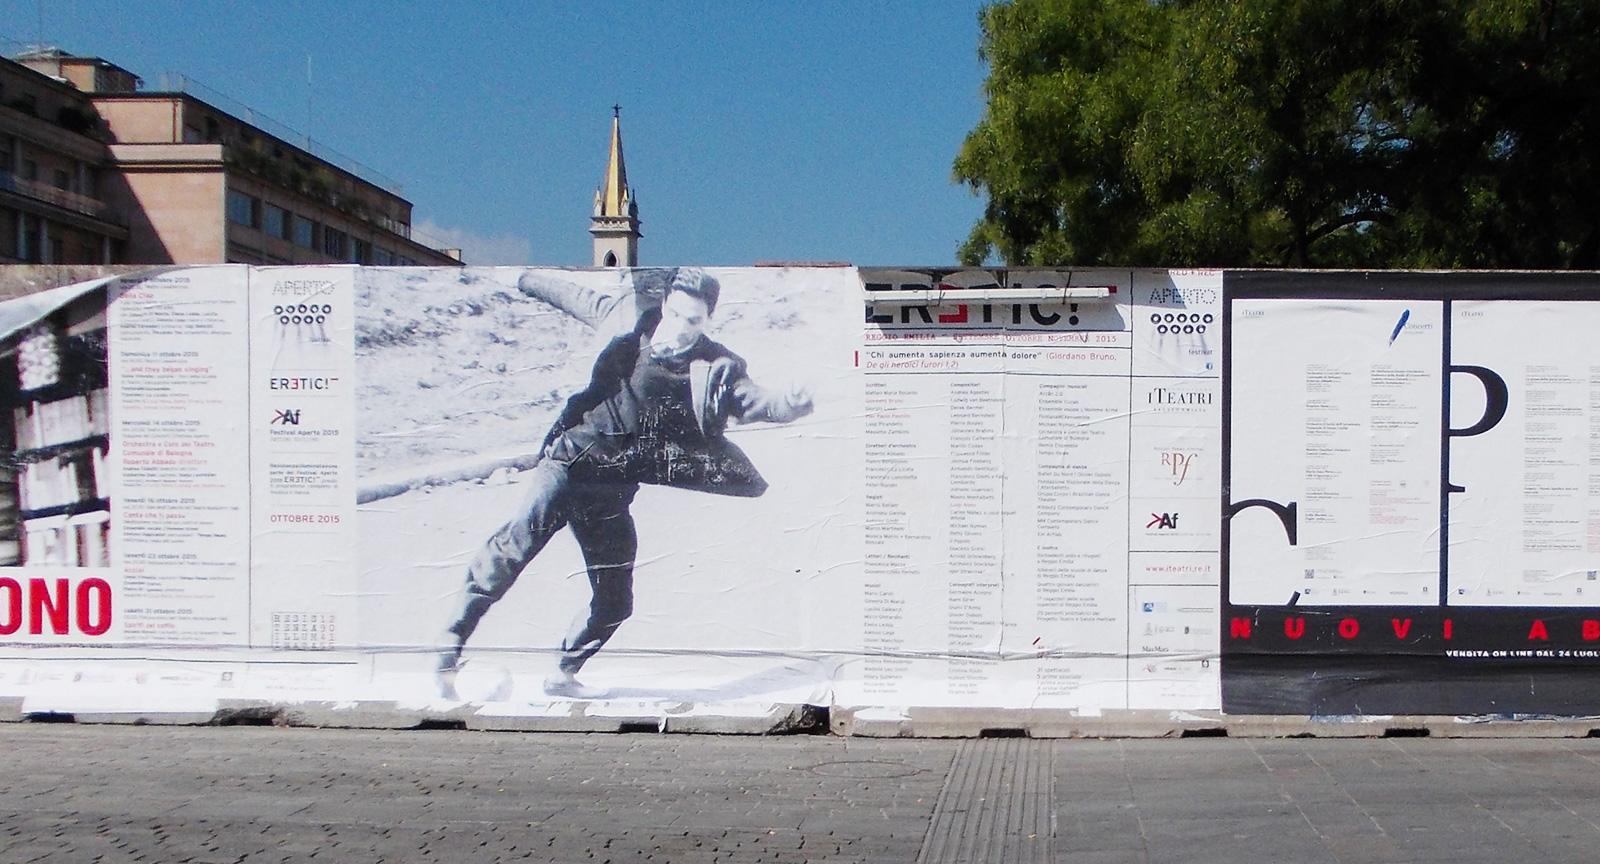 I-TEATRI_aperto-2015-manifesto-6x3